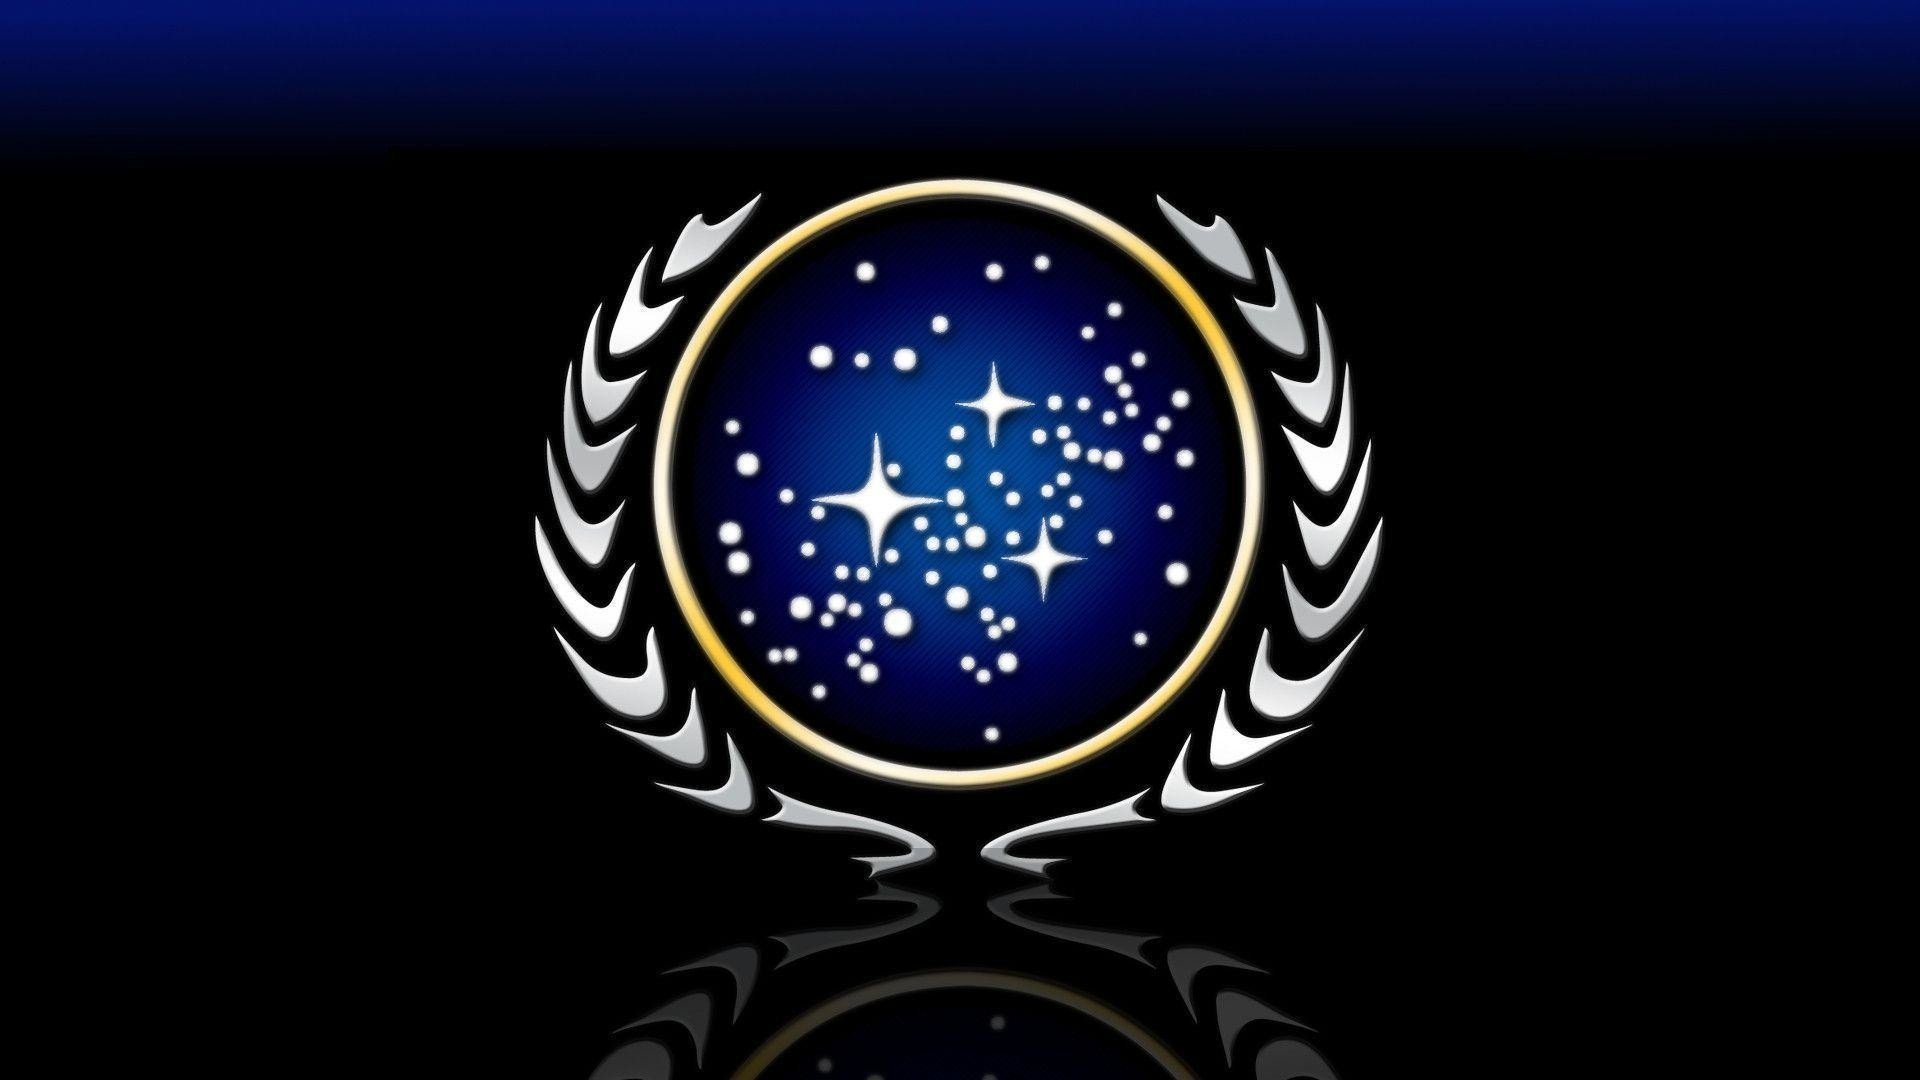 Star Trek, U.F.P. Wallpaper by ghostfac3killah on DeviantArt